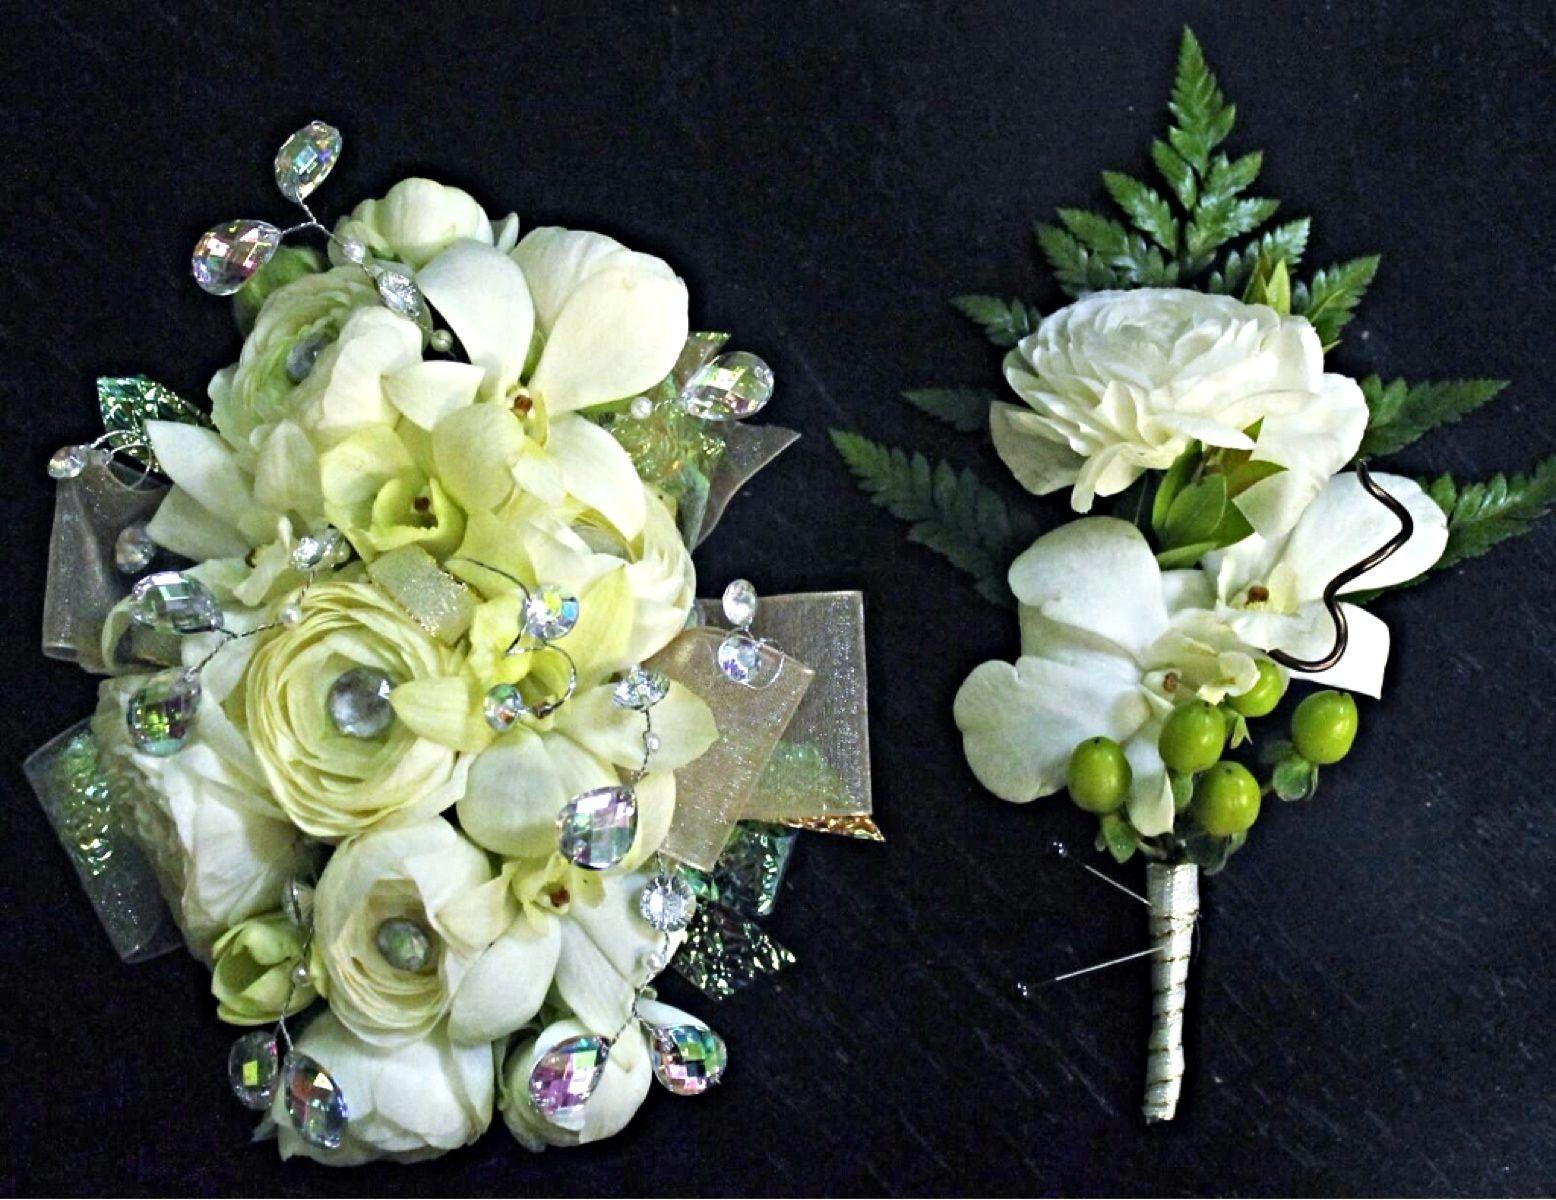 Beautiful corsage and boutonnière using ranunculus and orchids. #2floristgirls #floristofrowlett